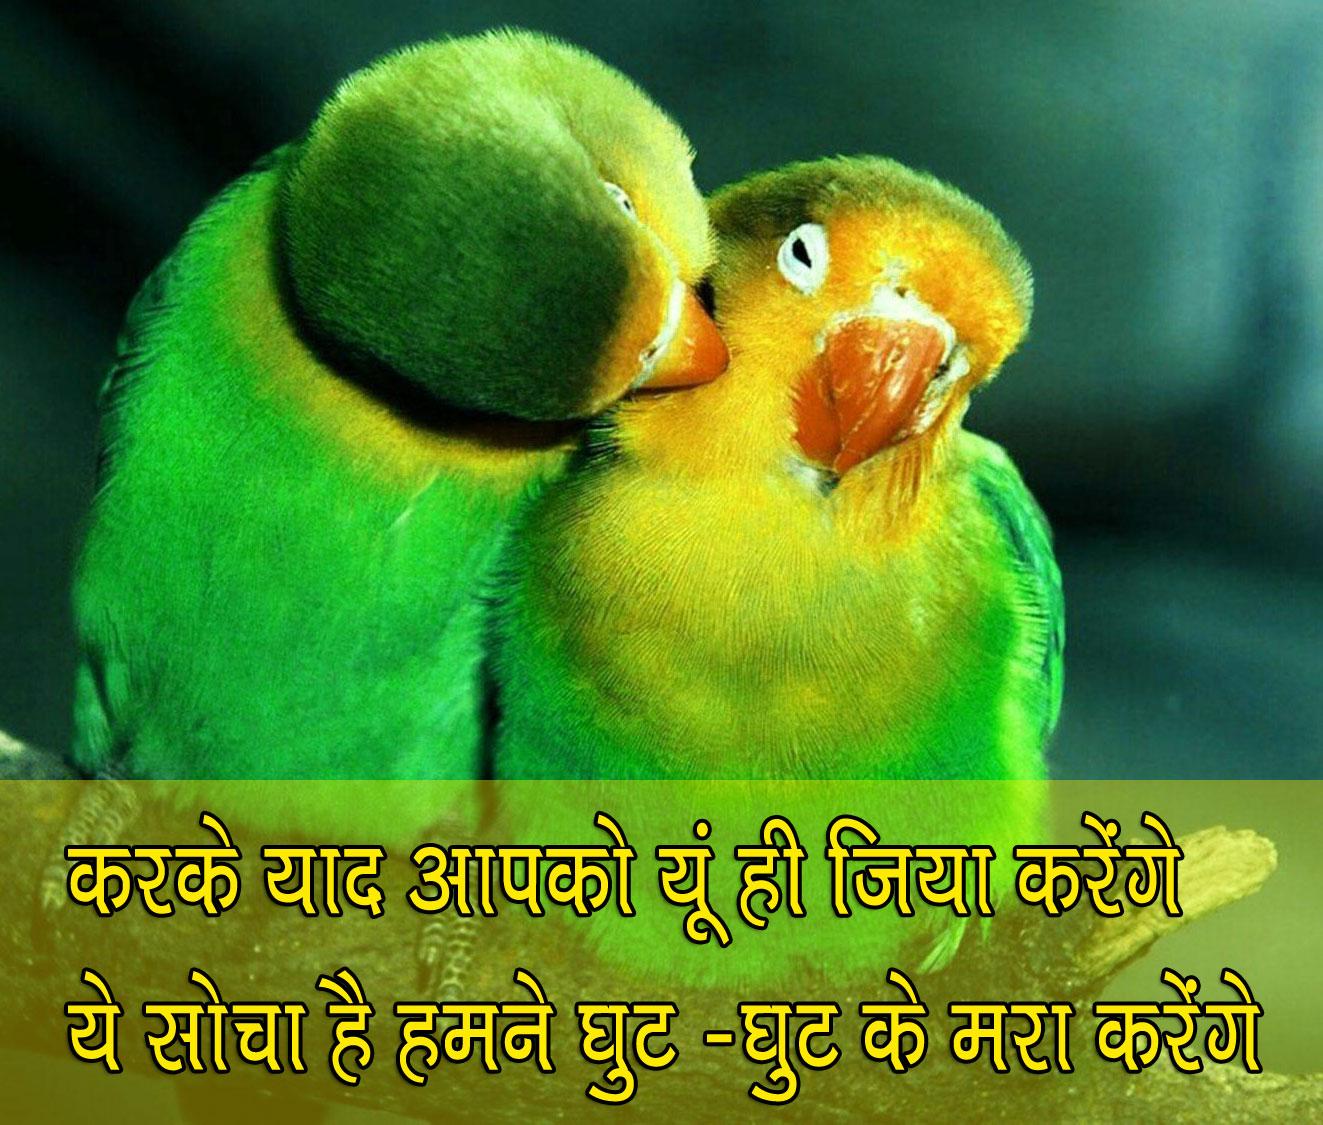 Best Hindi Shayari Images 24